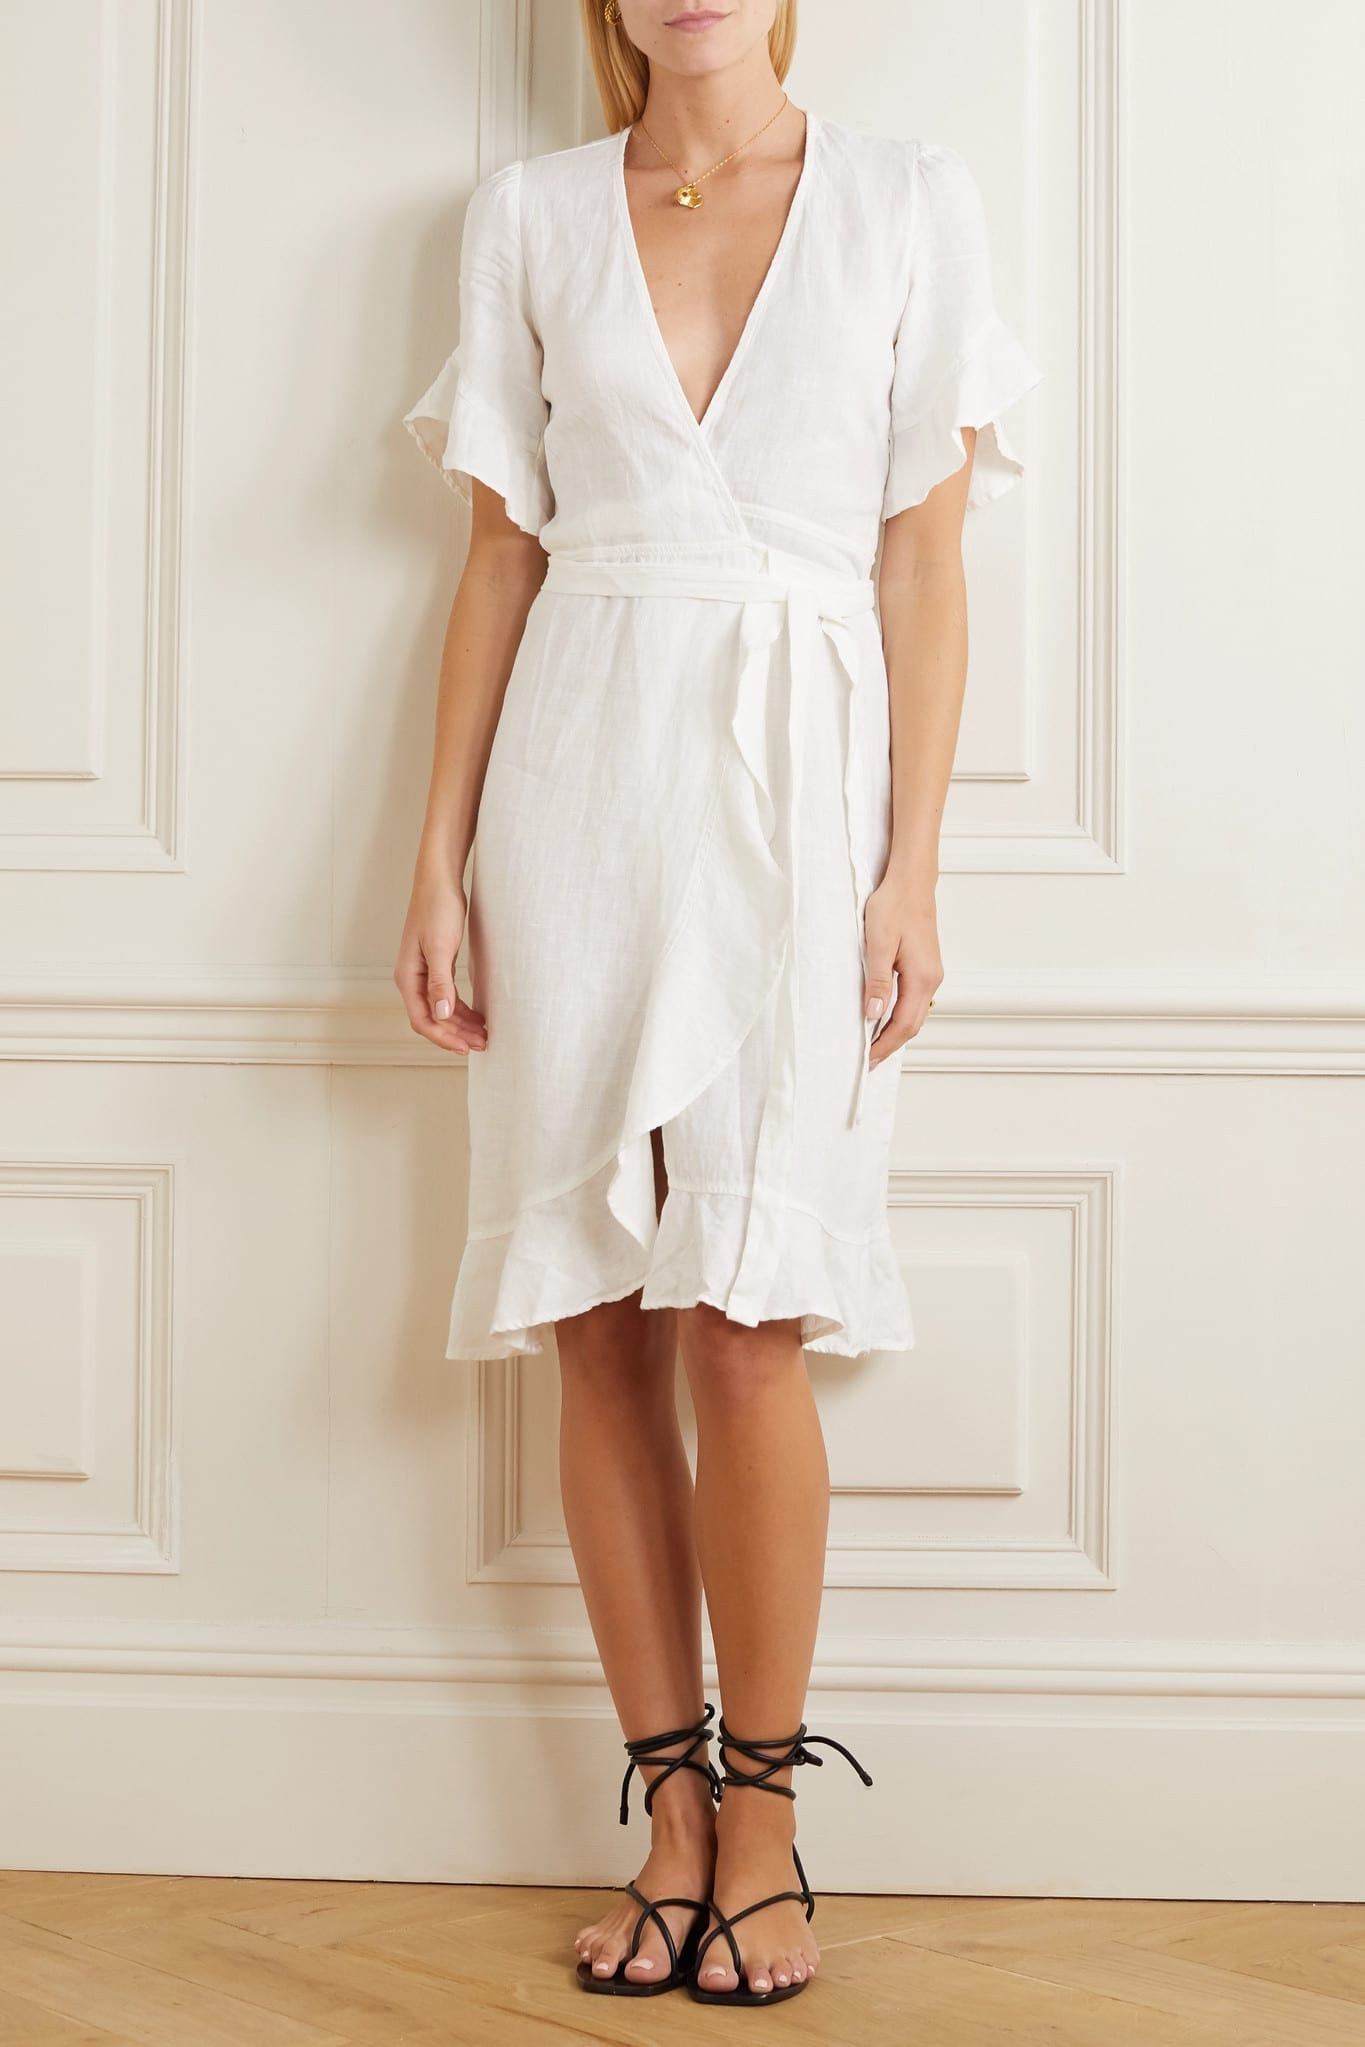 HONORINE Charlotte Ruffled Linen Wrap Dress